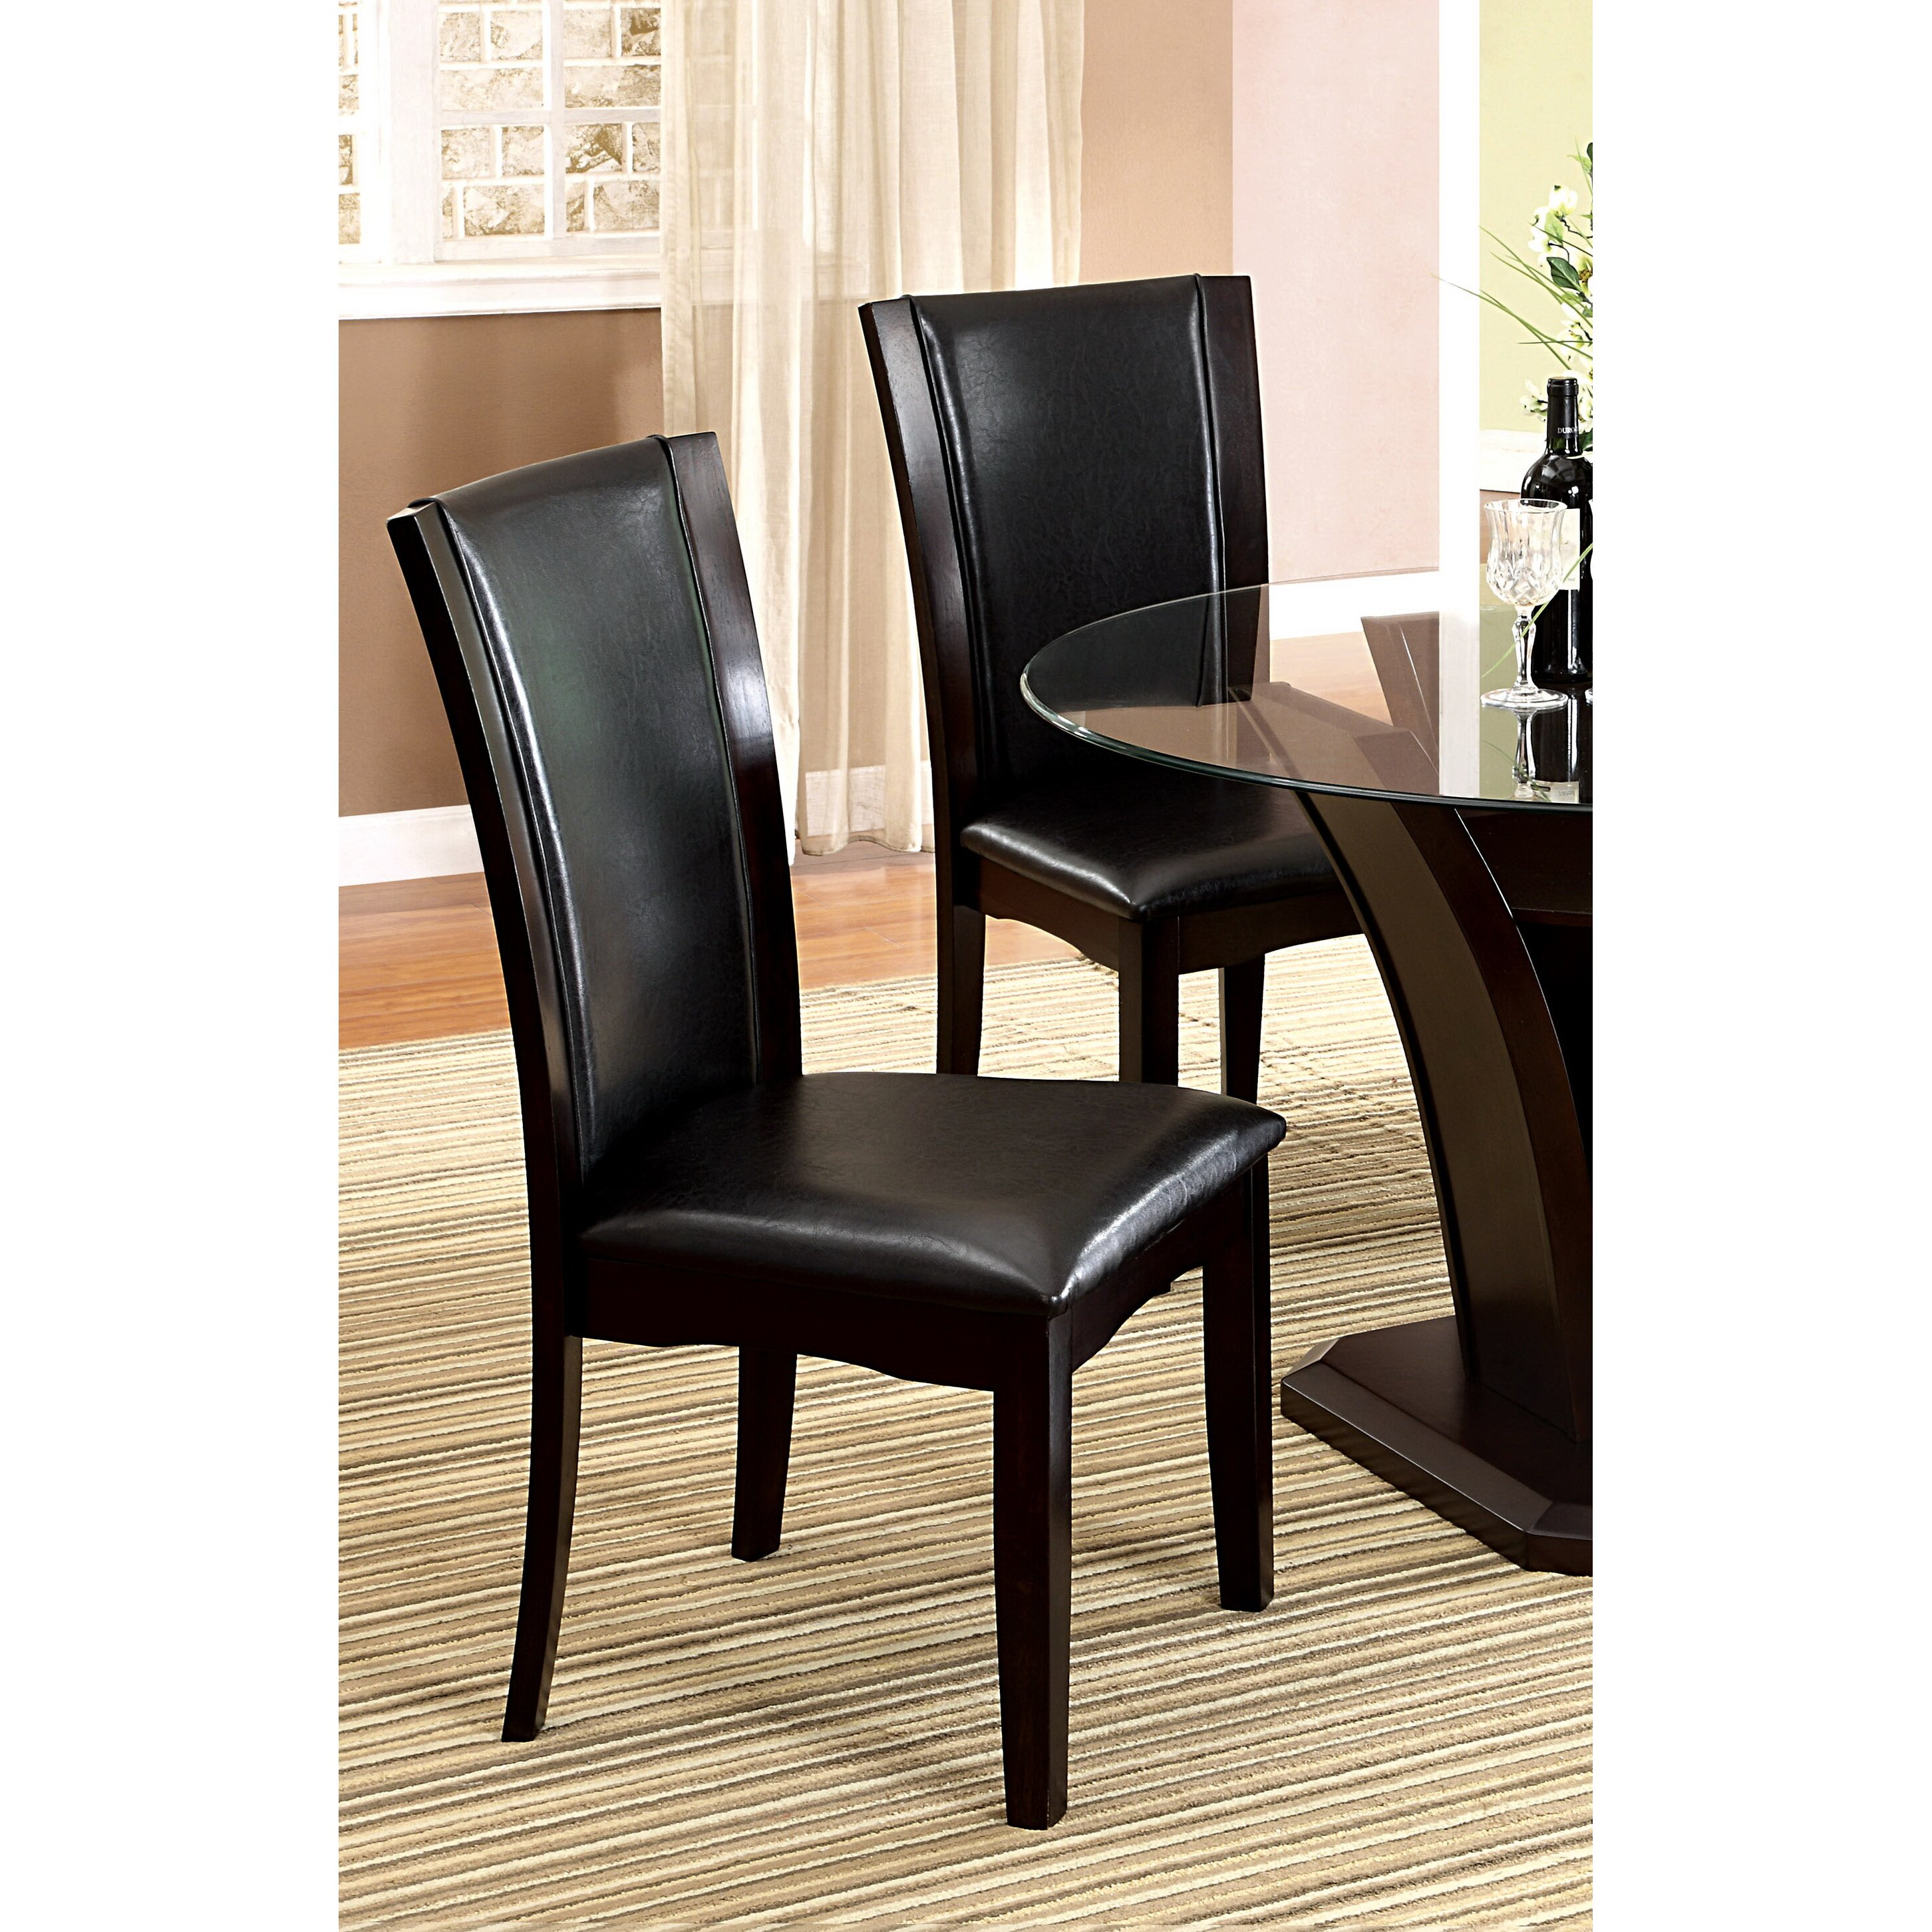 Hokku designs 5 piece dining set reviews wayfair for Hokku designs dining room furniture